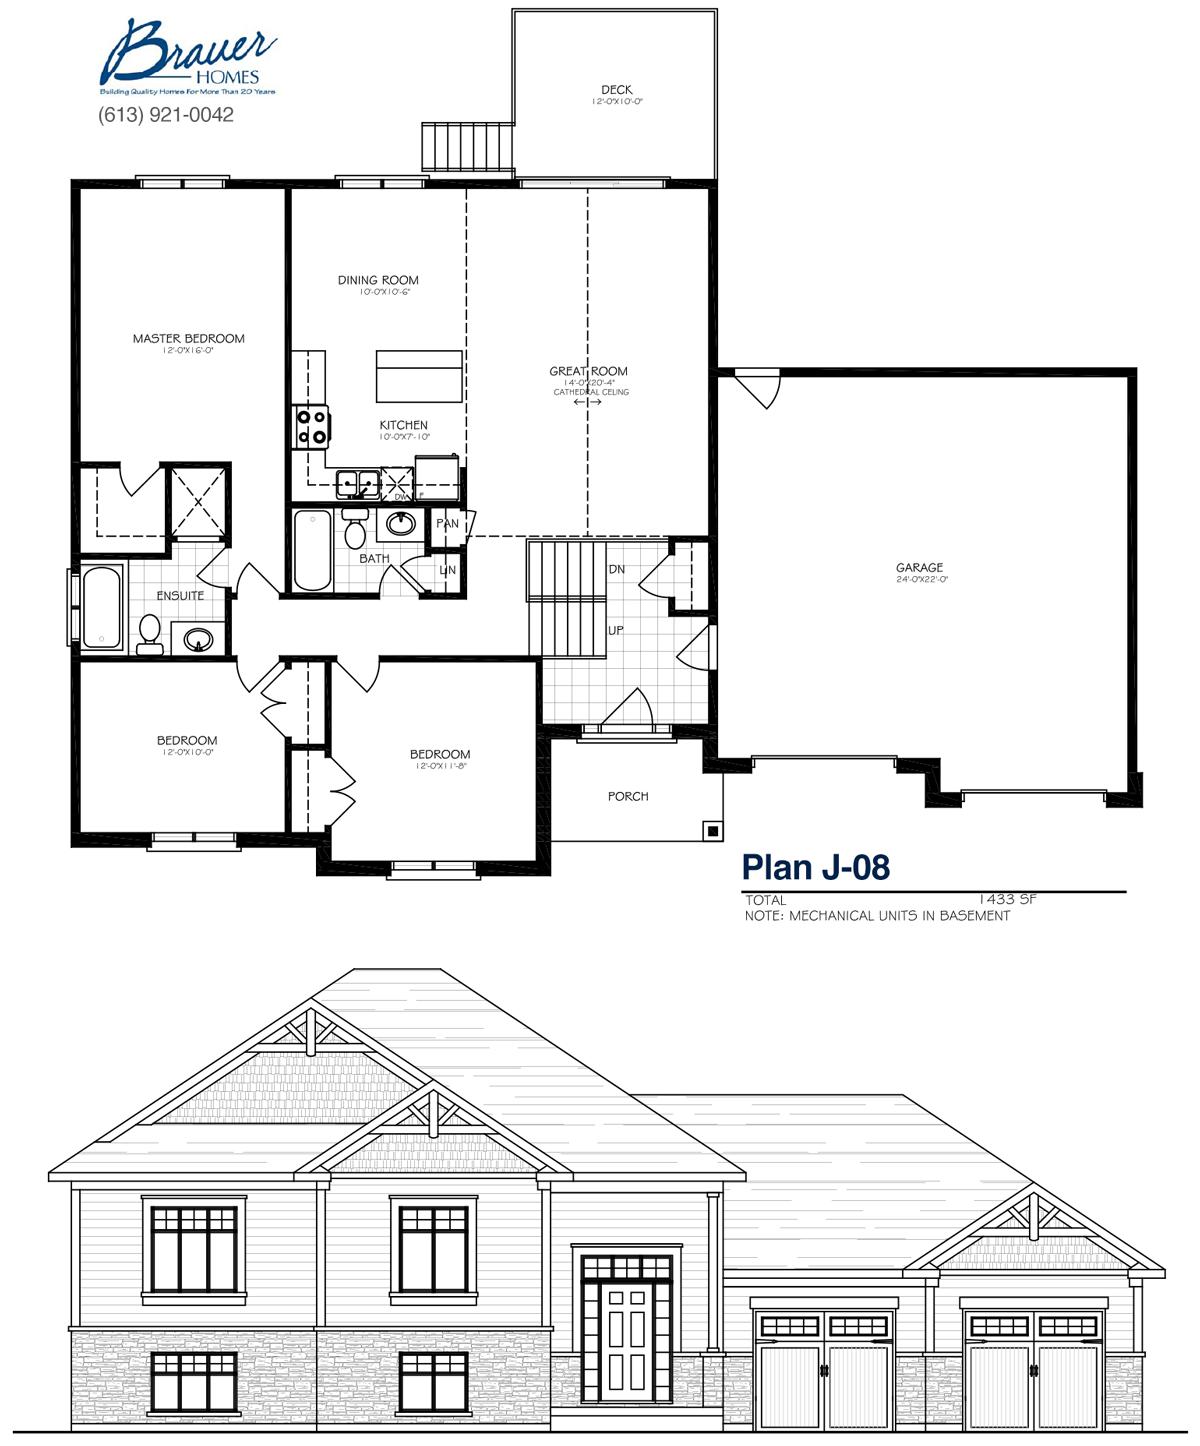 Brauer Build Plan J-08